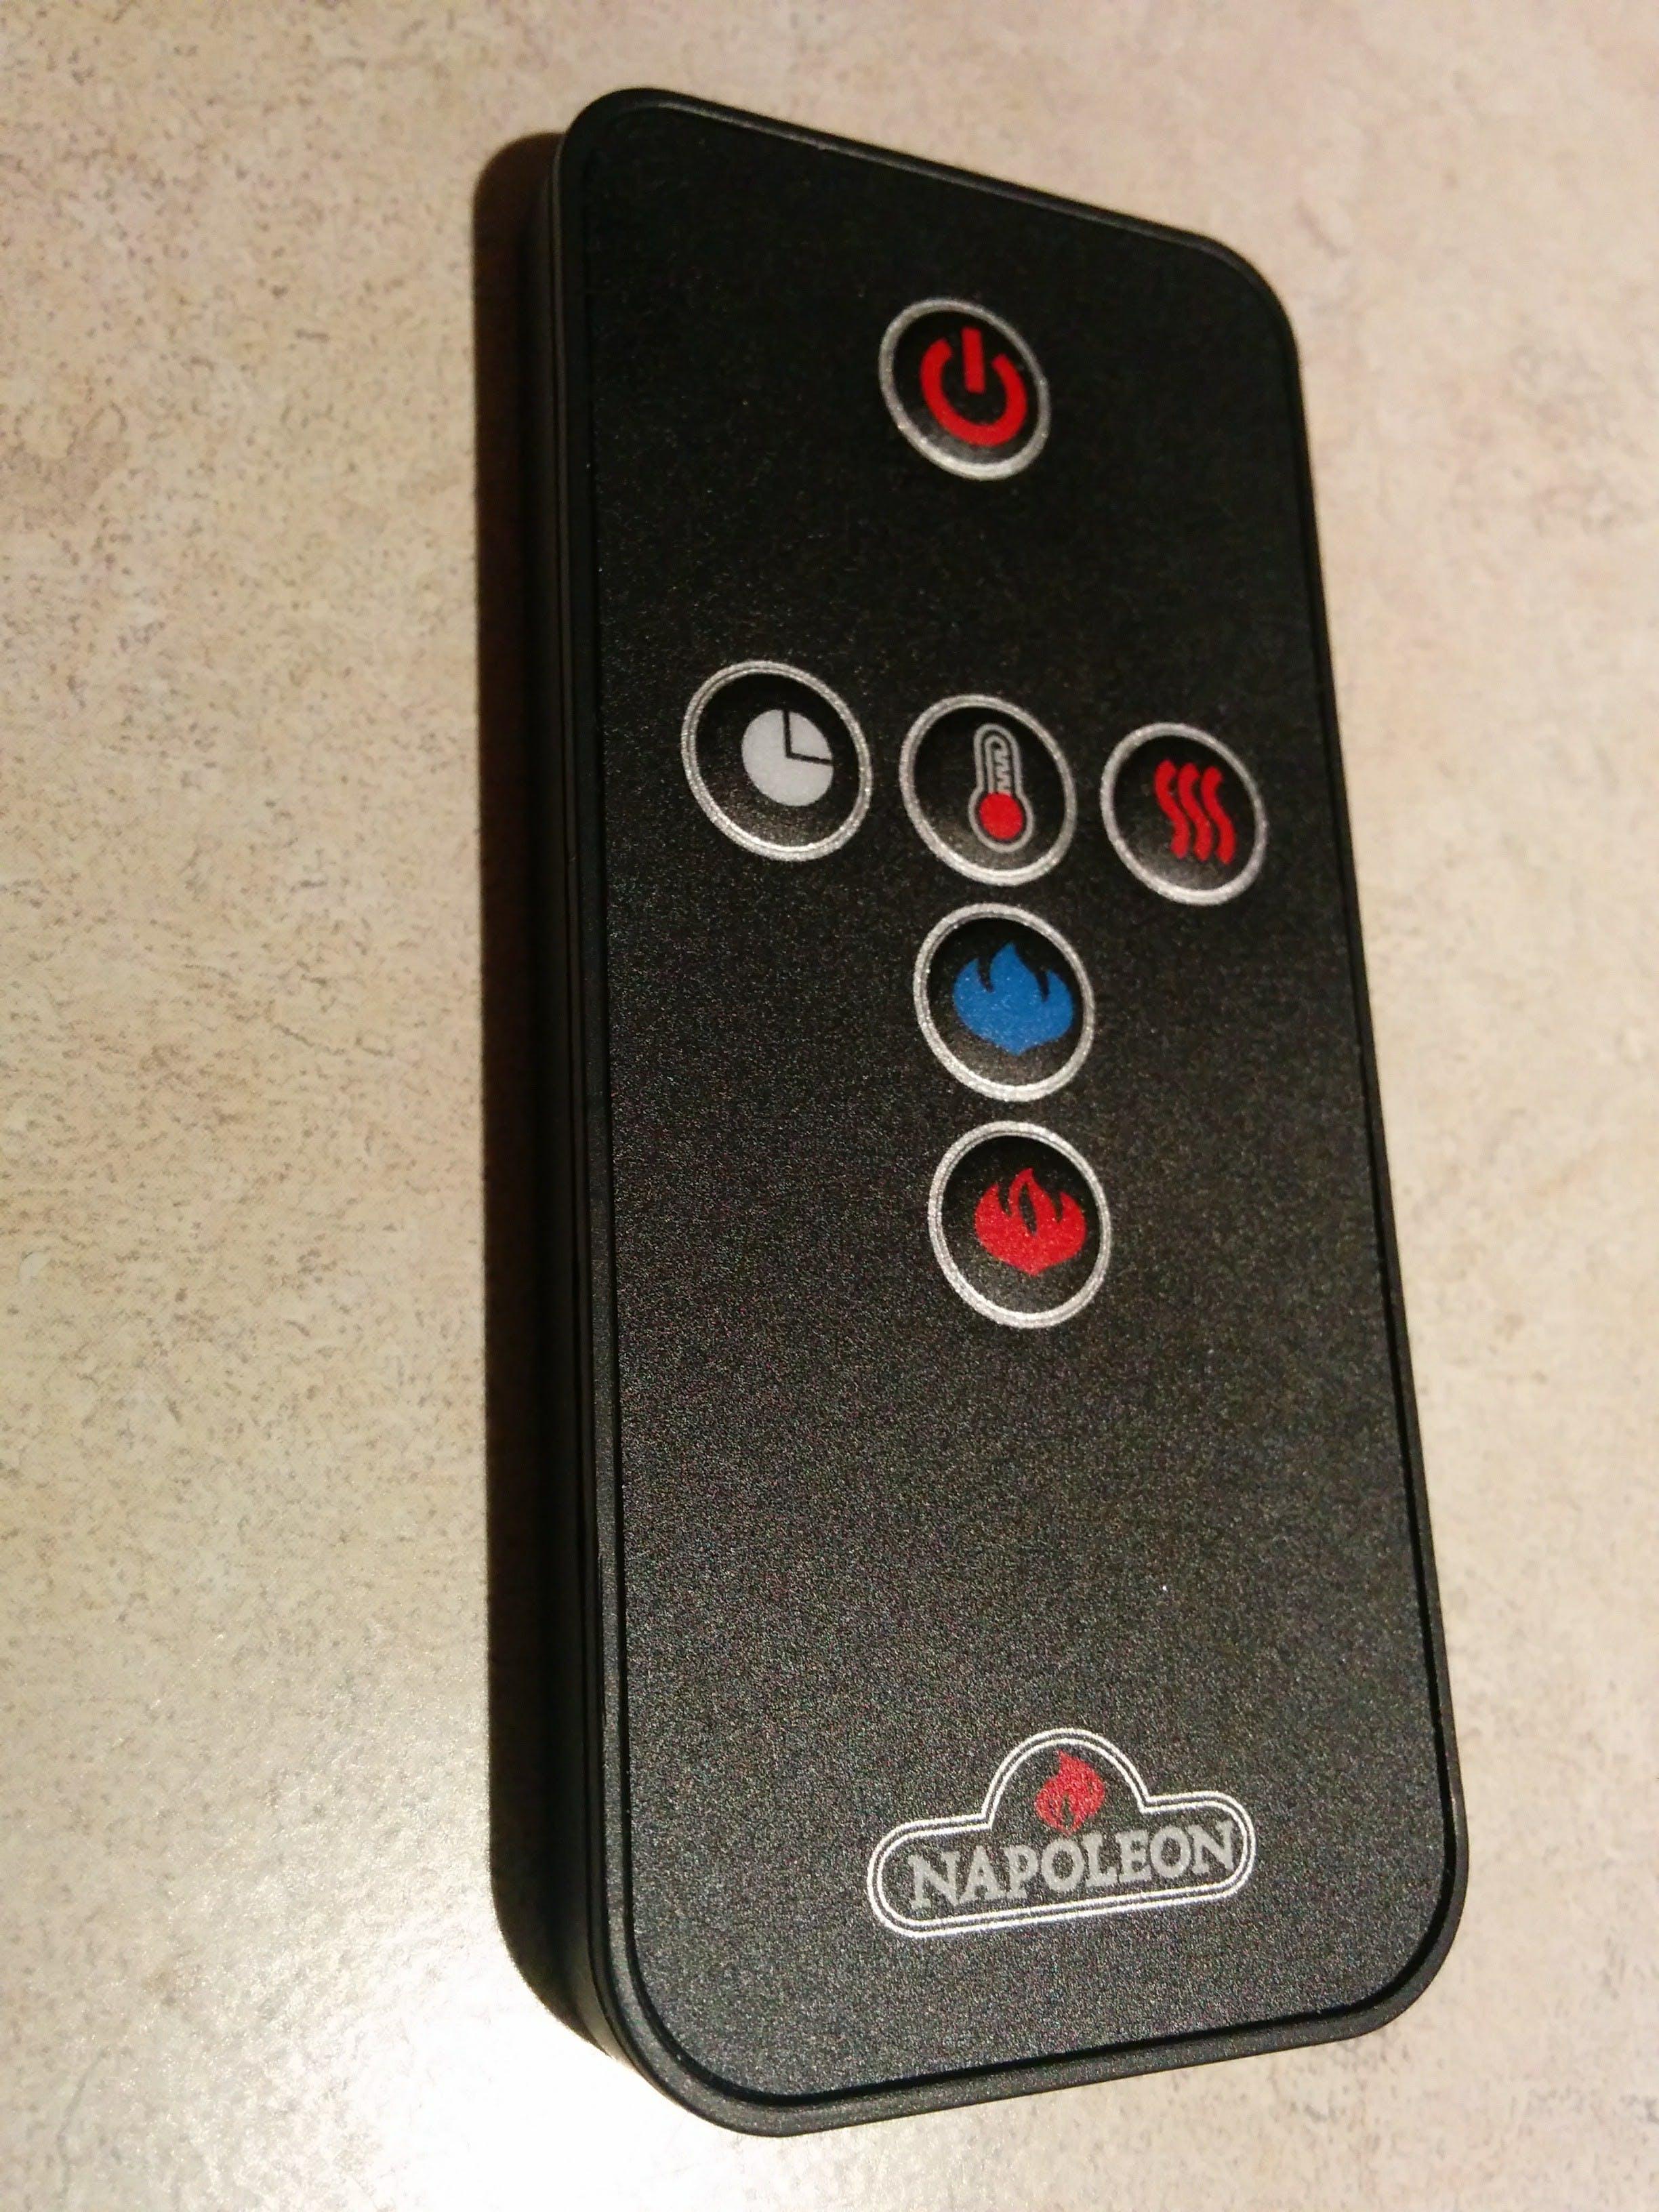 Original infrared remote control